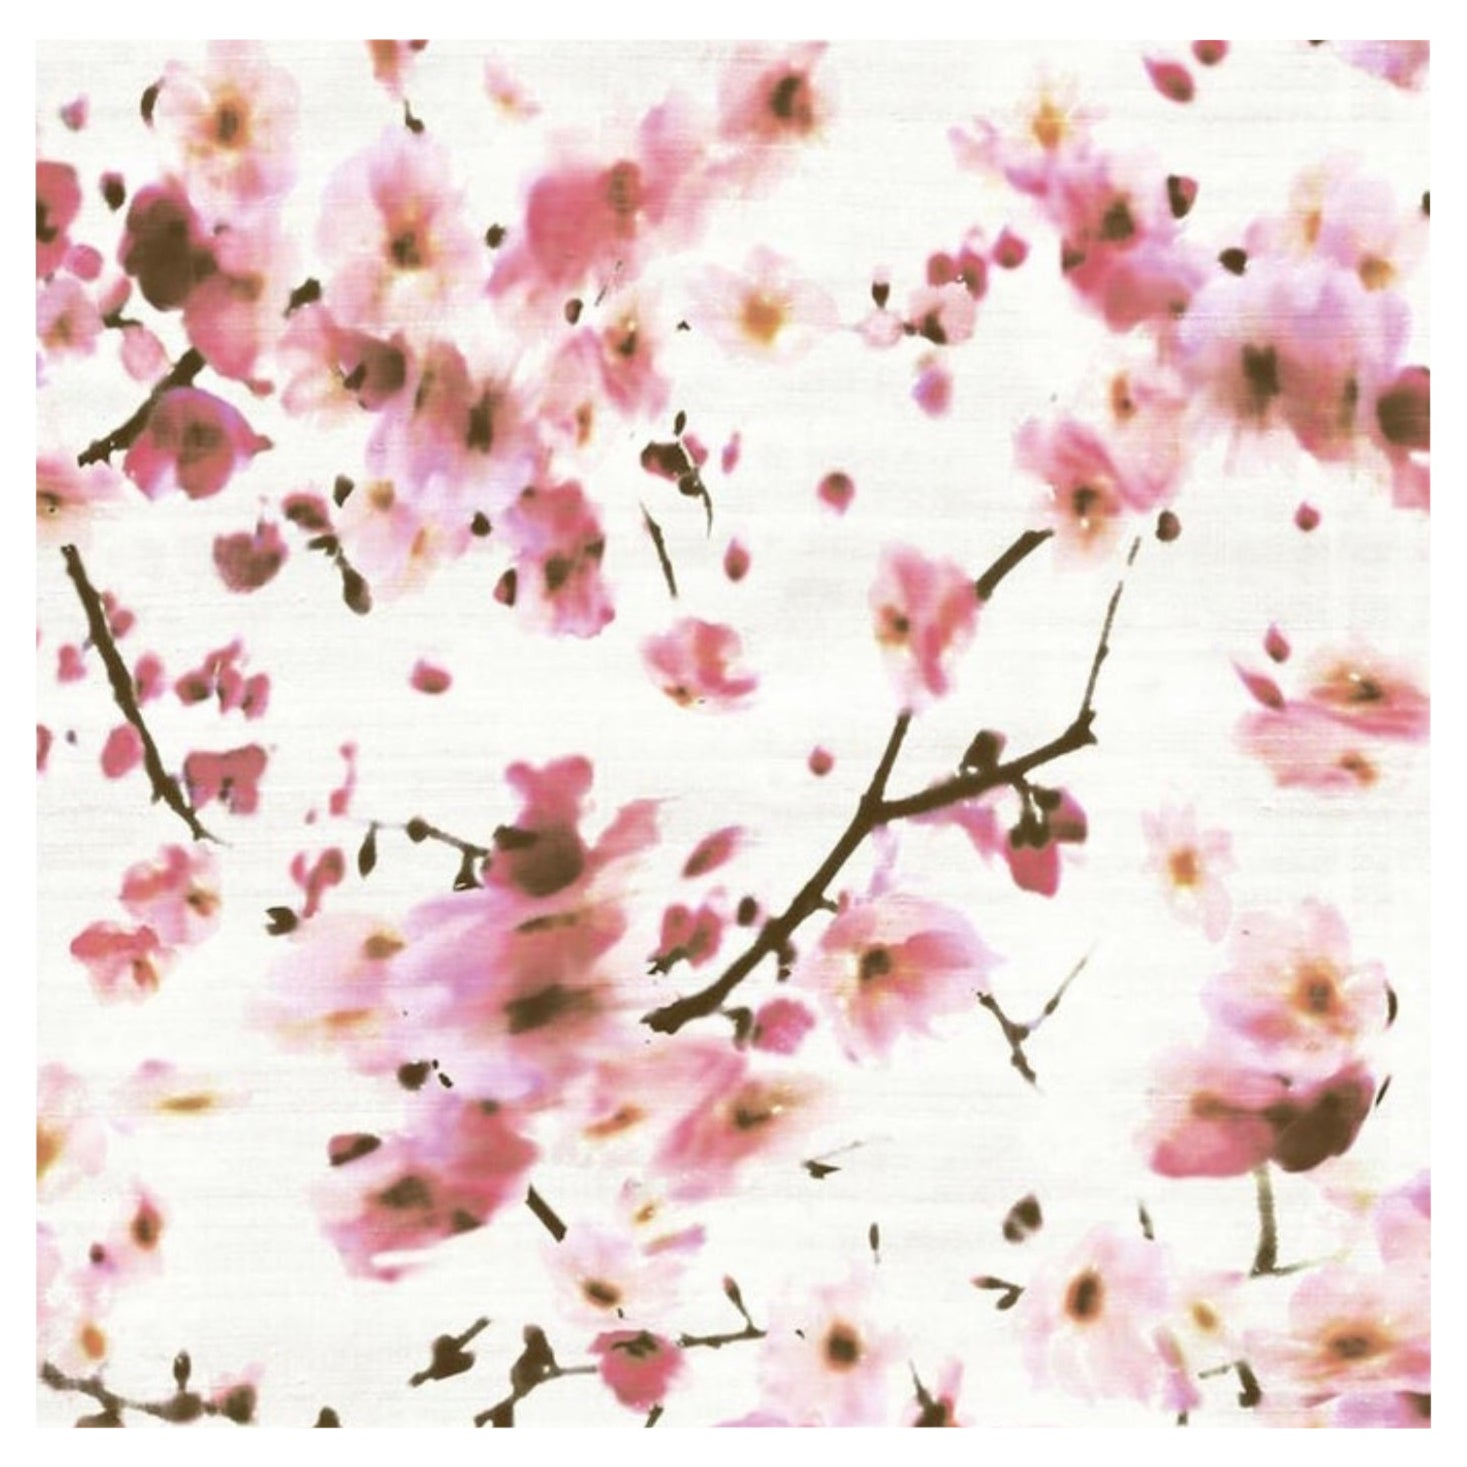 French Wallpaper by Elitis 'Kandy' Sakura Cherry Blossom Floral Watercolor Silk